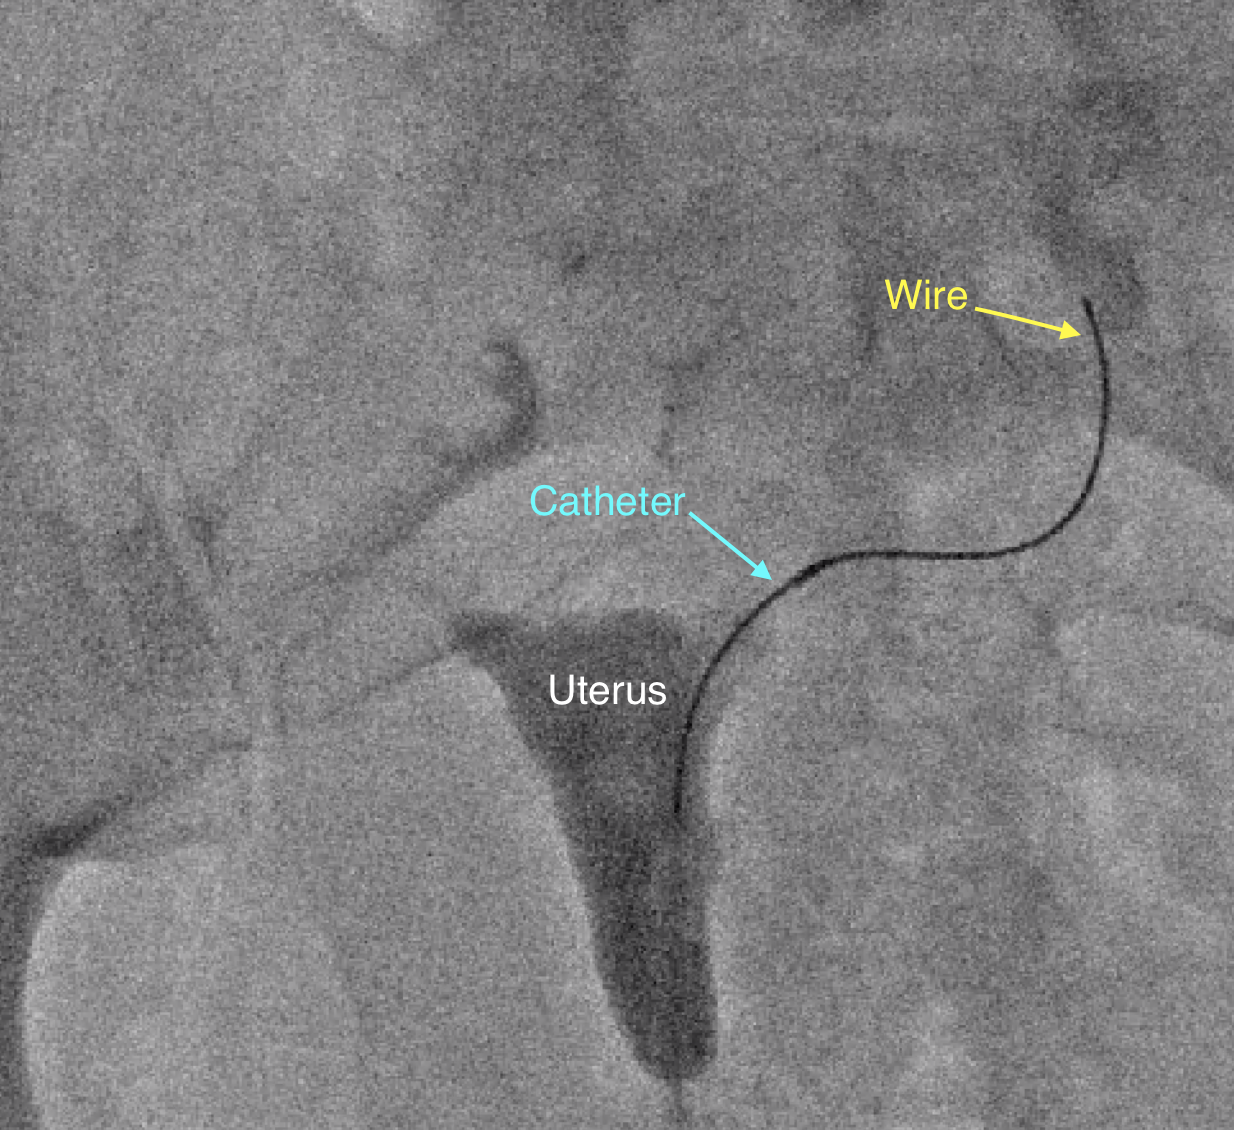 fallopian tube recanalization